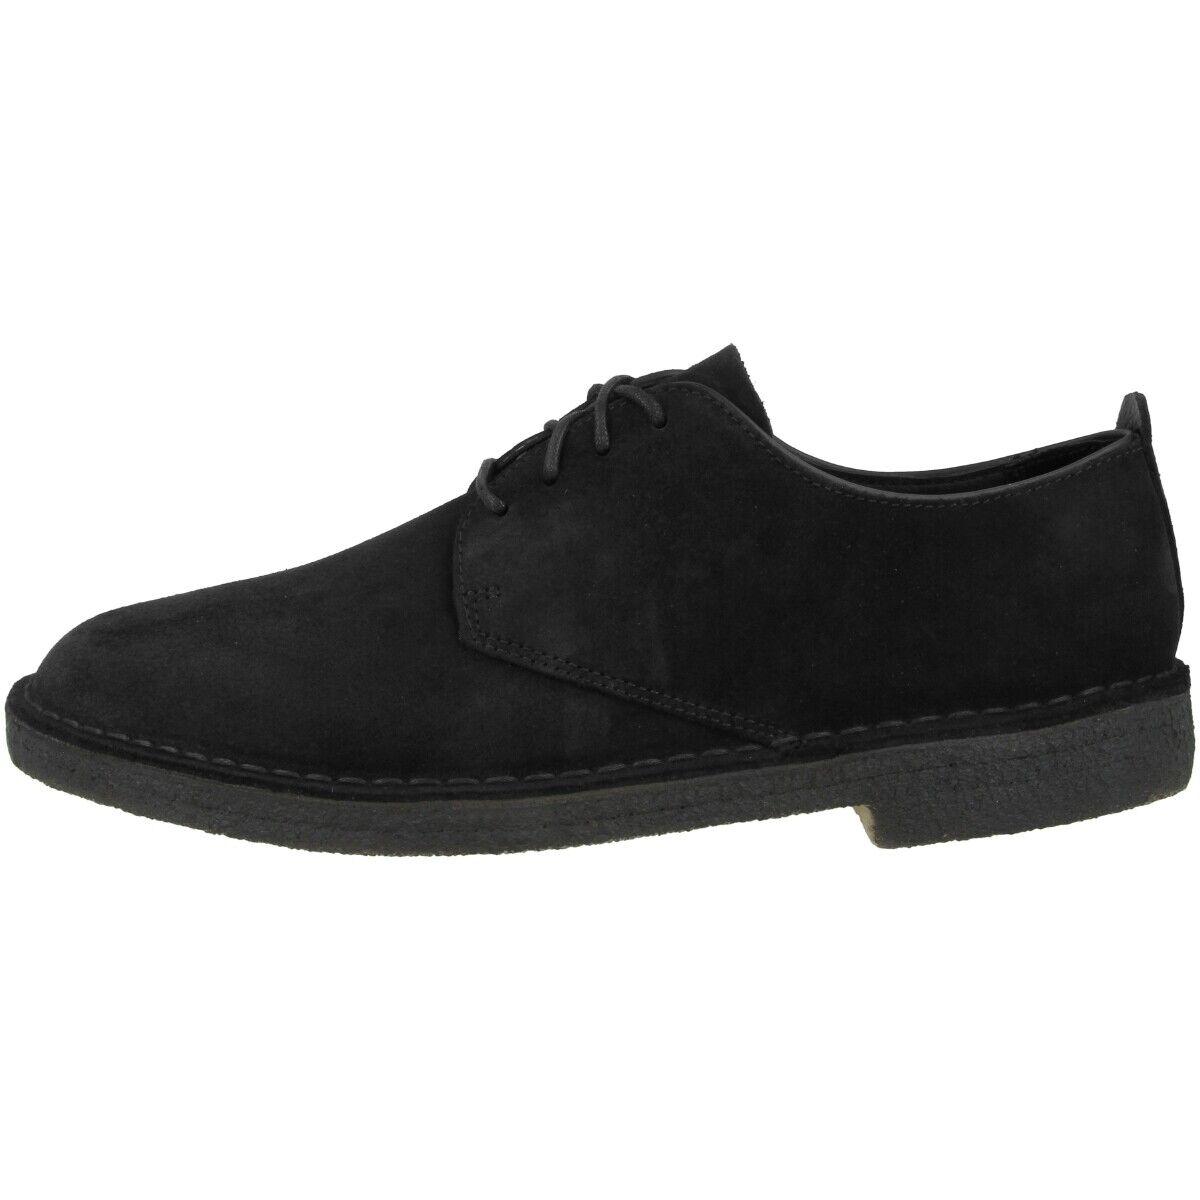 Clarks Desert London Schuhe Herren Halbschuhe Business Schnürer schwarz 26133274